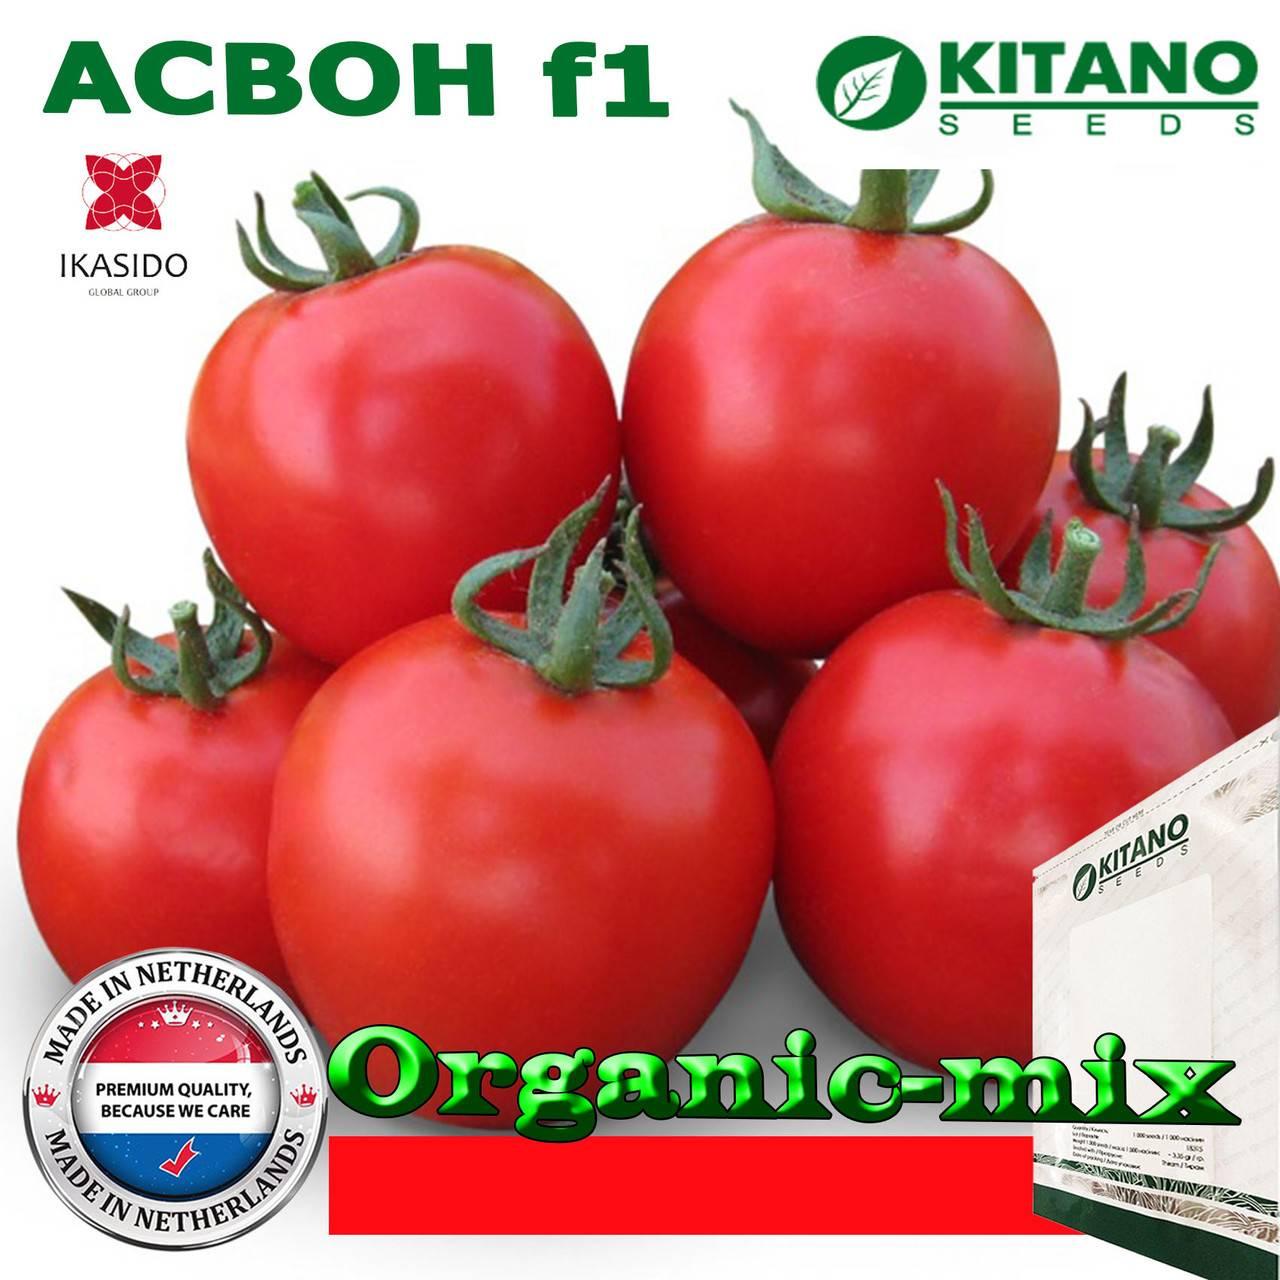 Характеристики и описание сорта томата асвон, особенности выращивания